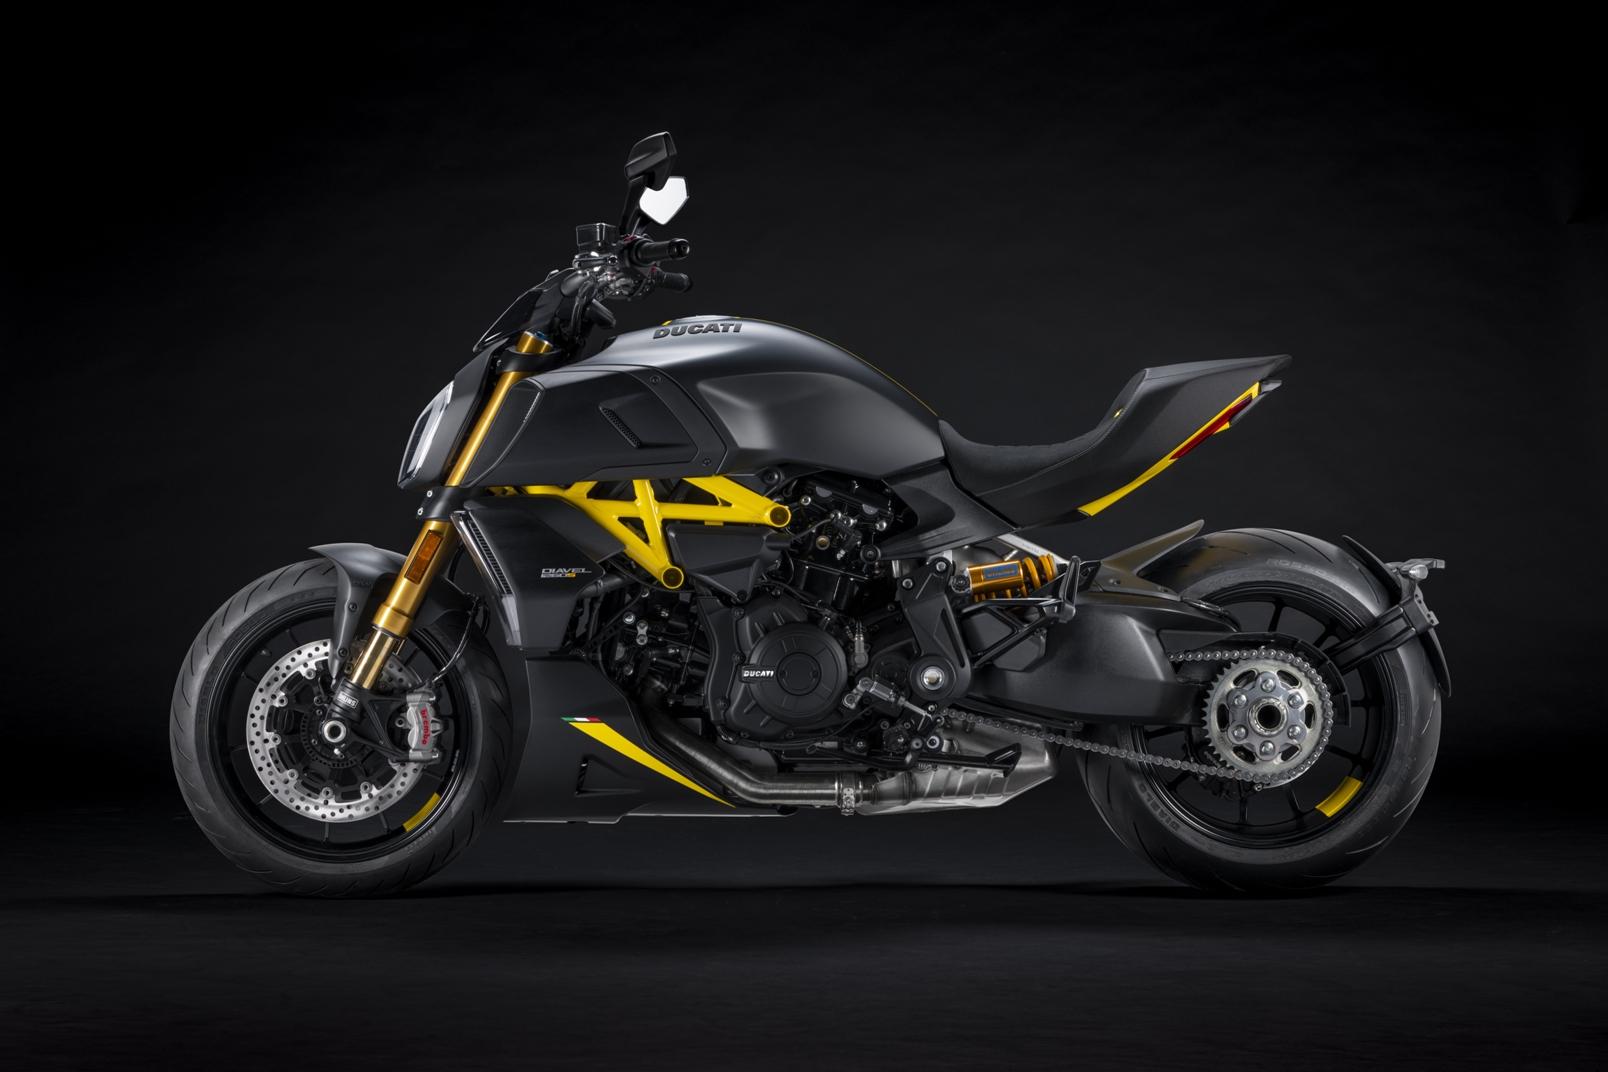 Ducati Diavel 1260 S Black And Steel (5)